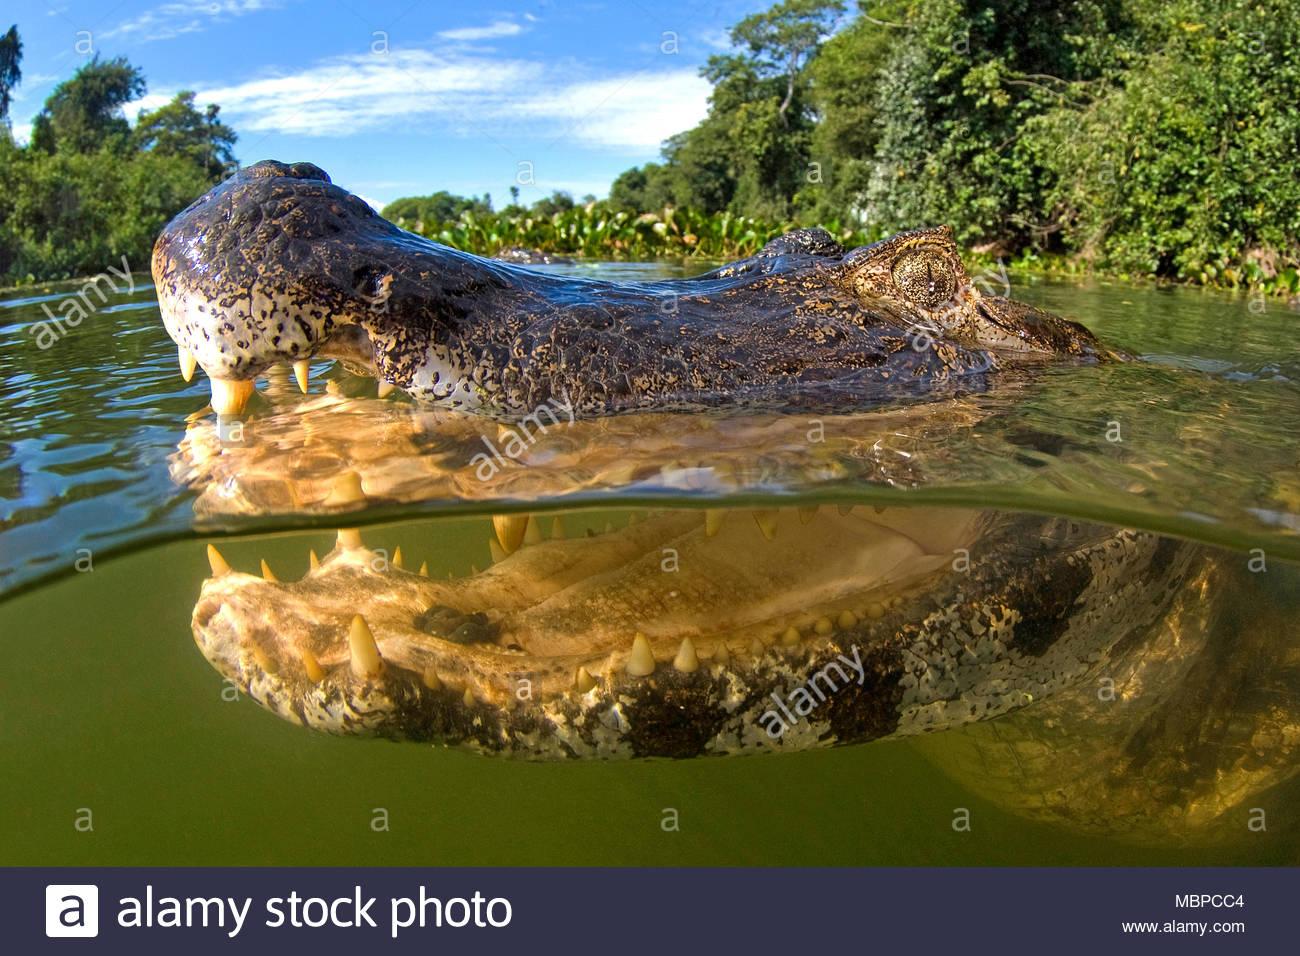 Yacare Caiman (Caiman yacare), split image, Mato Grosso do Sul, Pantanal, Brazil - Stock Image